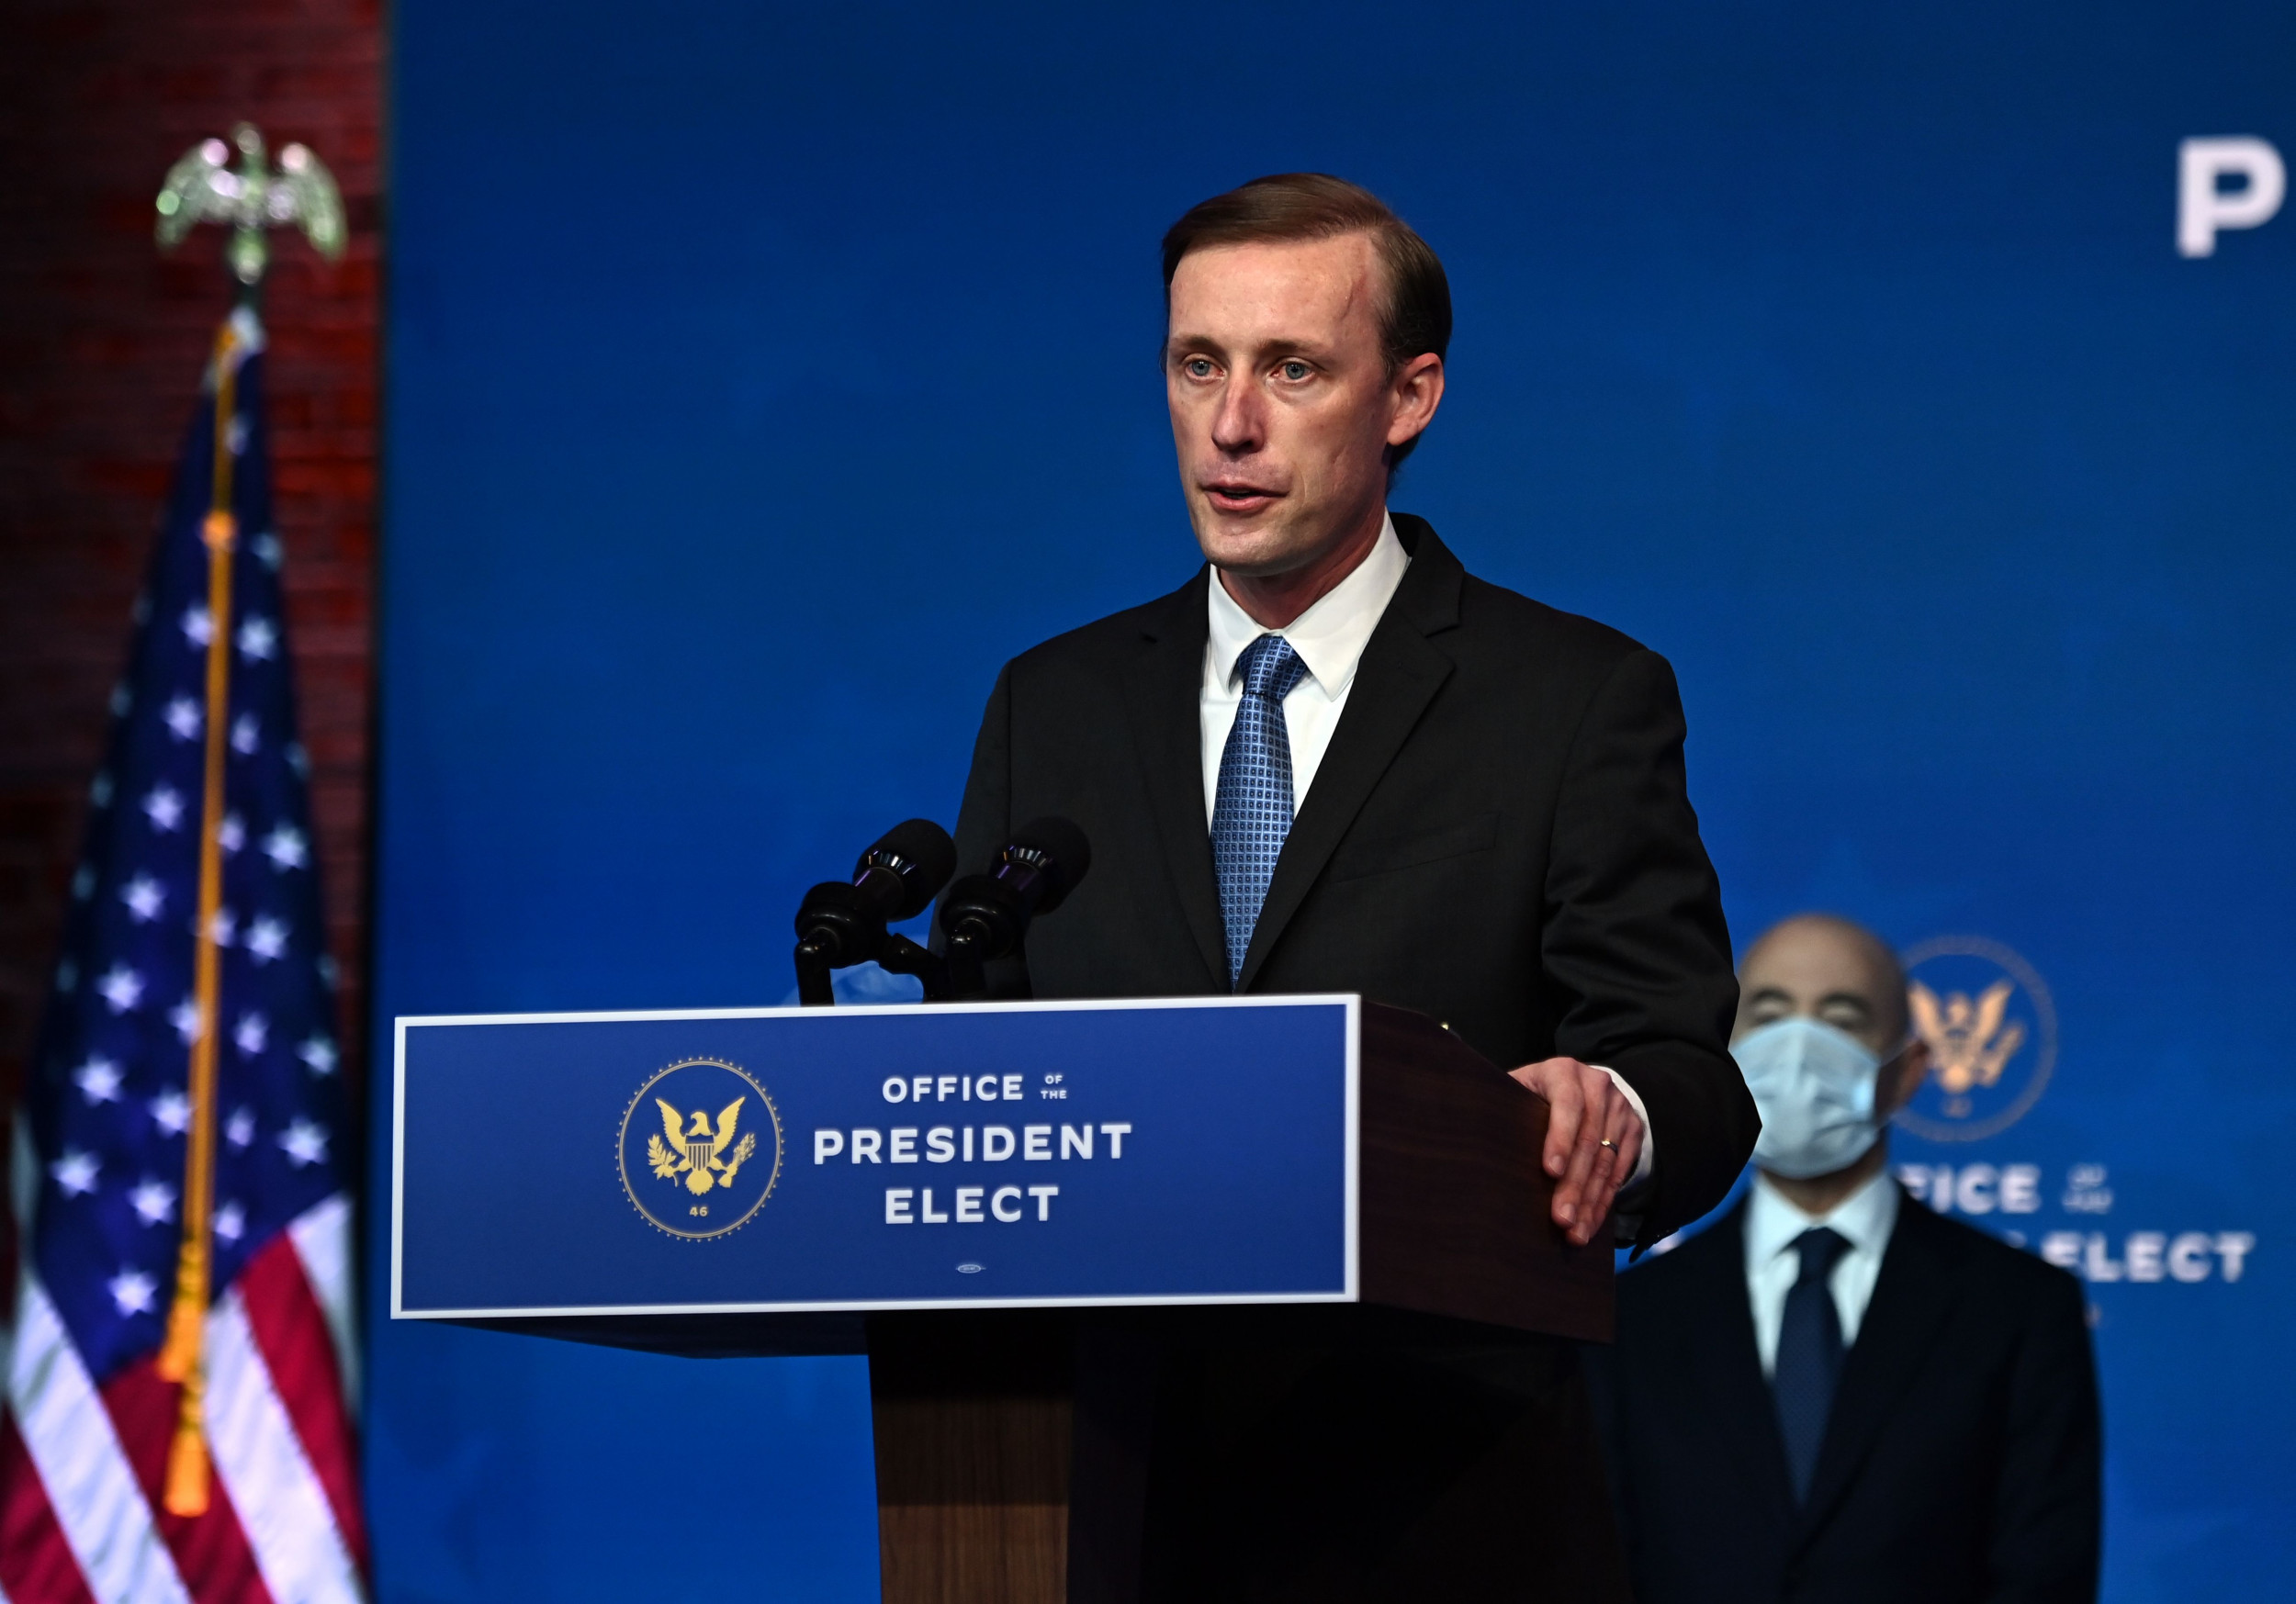 Joe Biden's NSA nominee says U.S. would send a message to China over coronavirus response